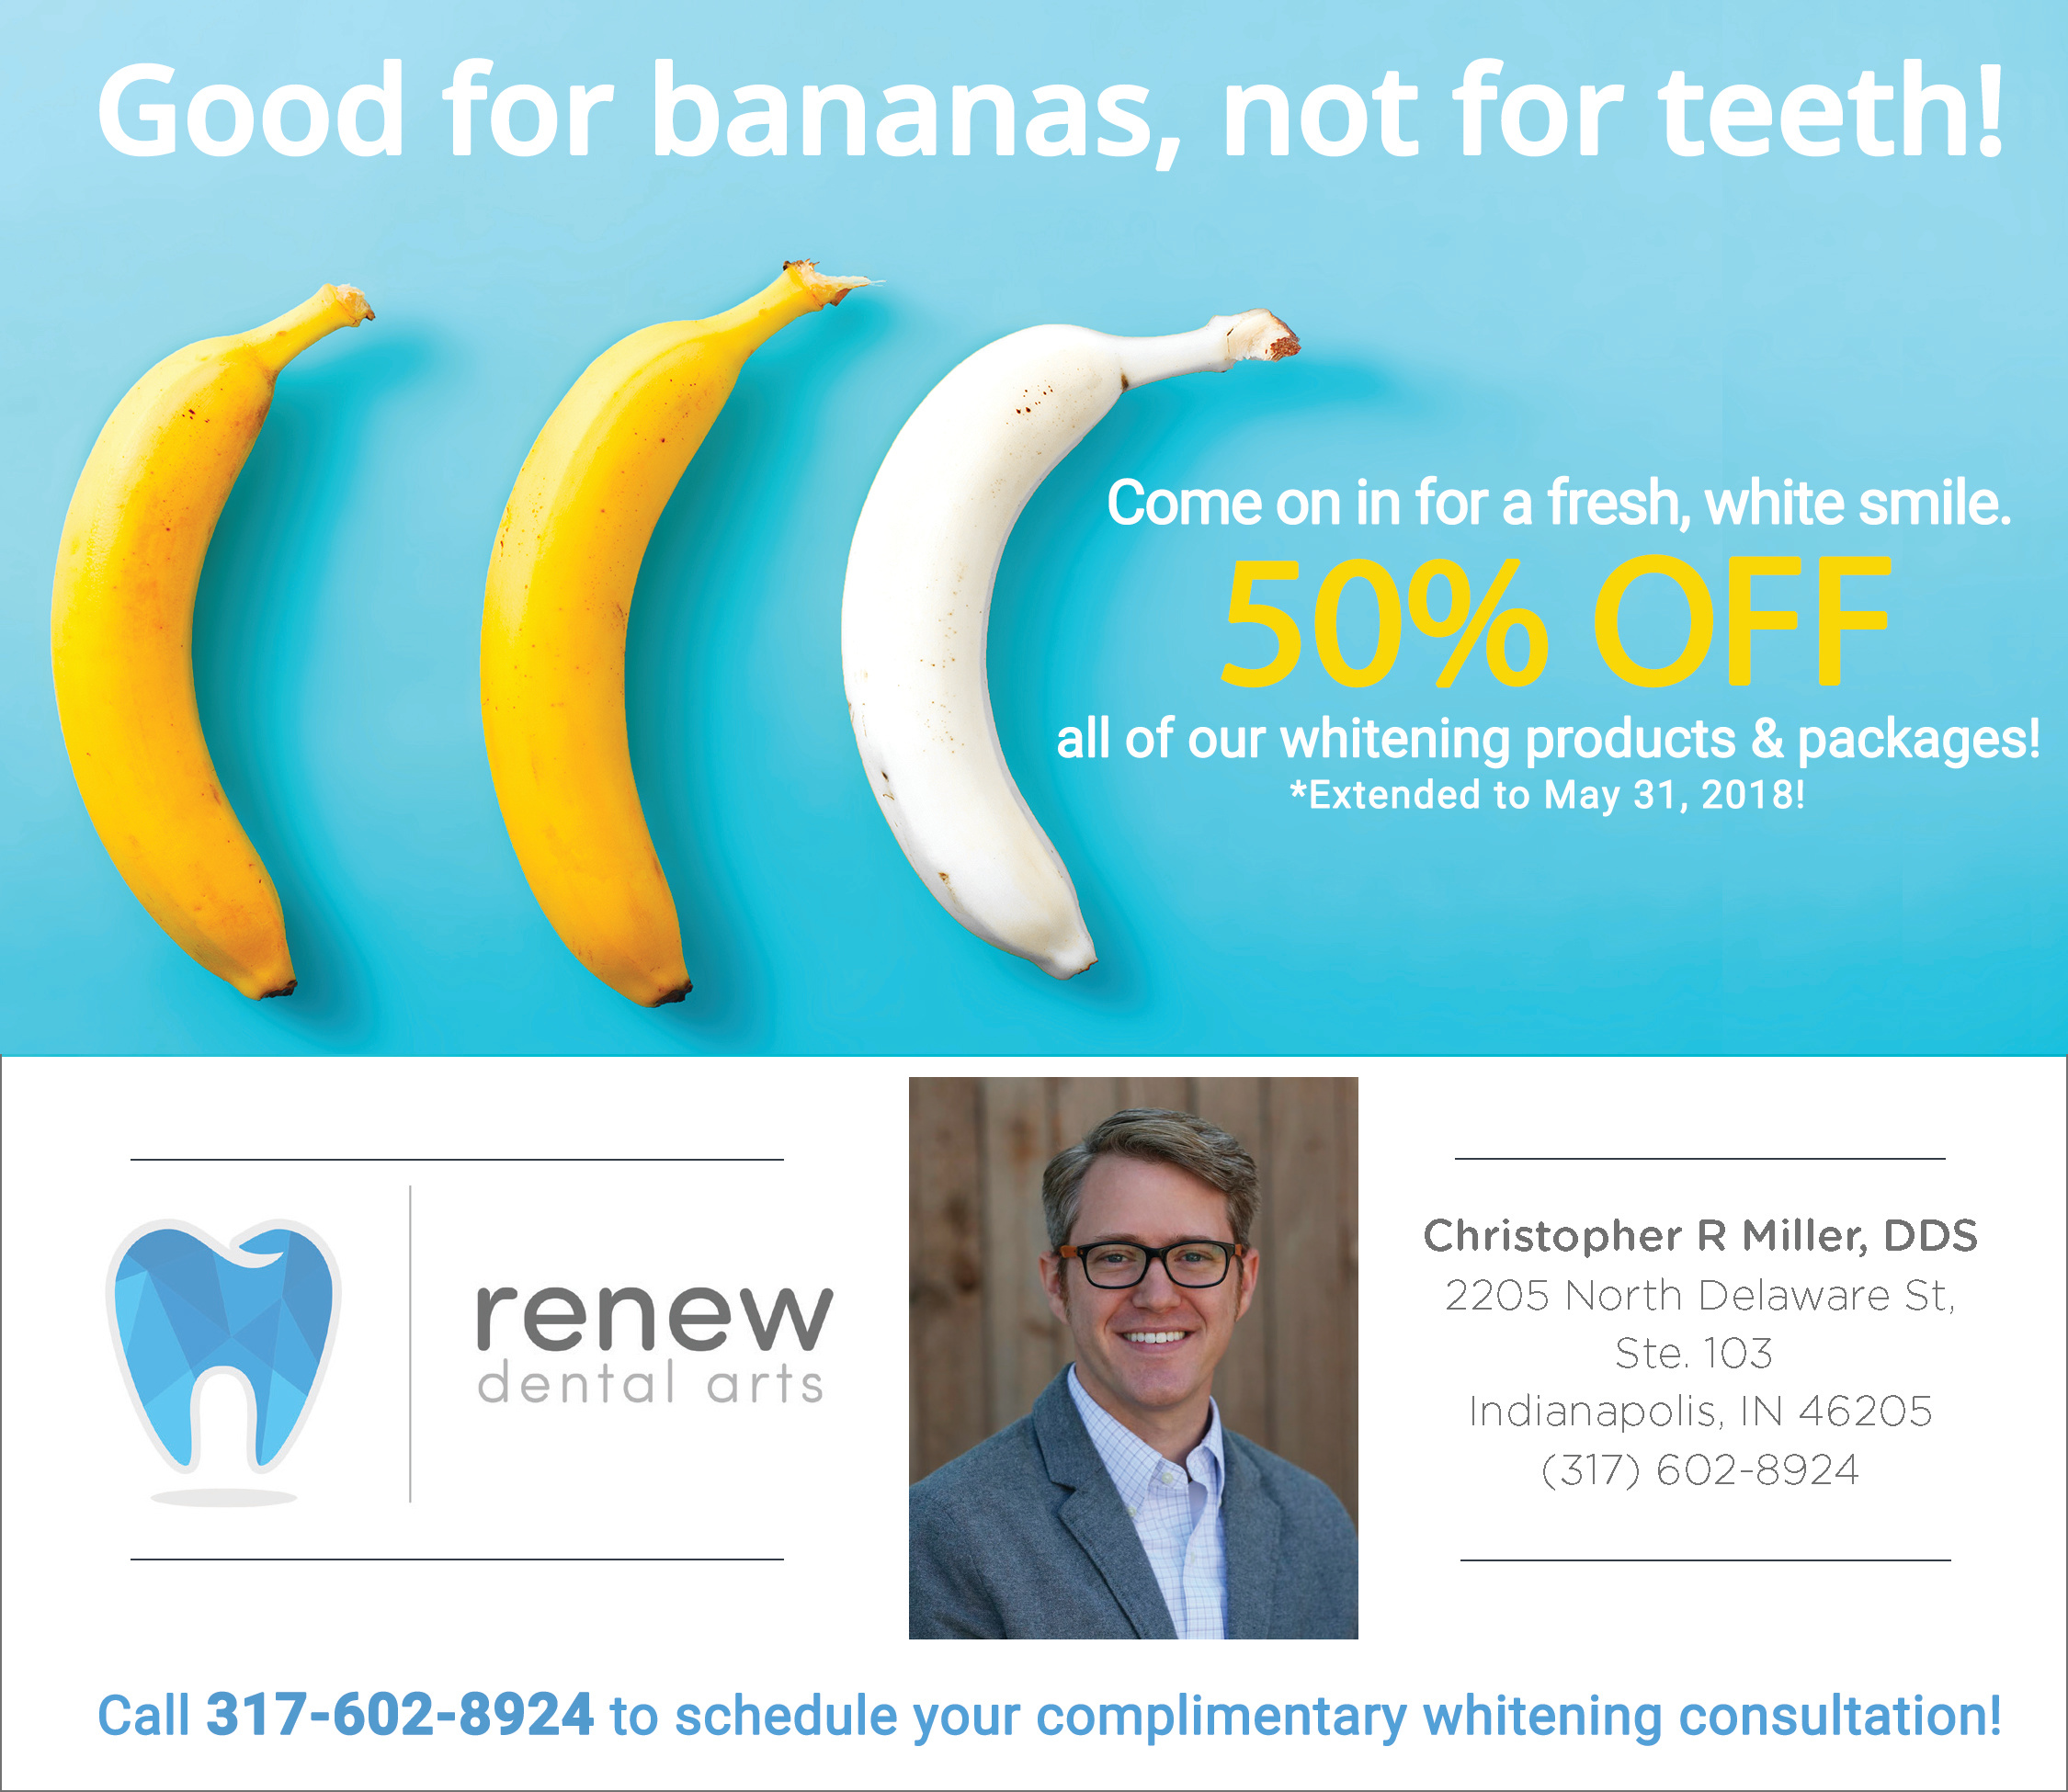 high_quality_renew_dental_arts_23_standard_may_2018